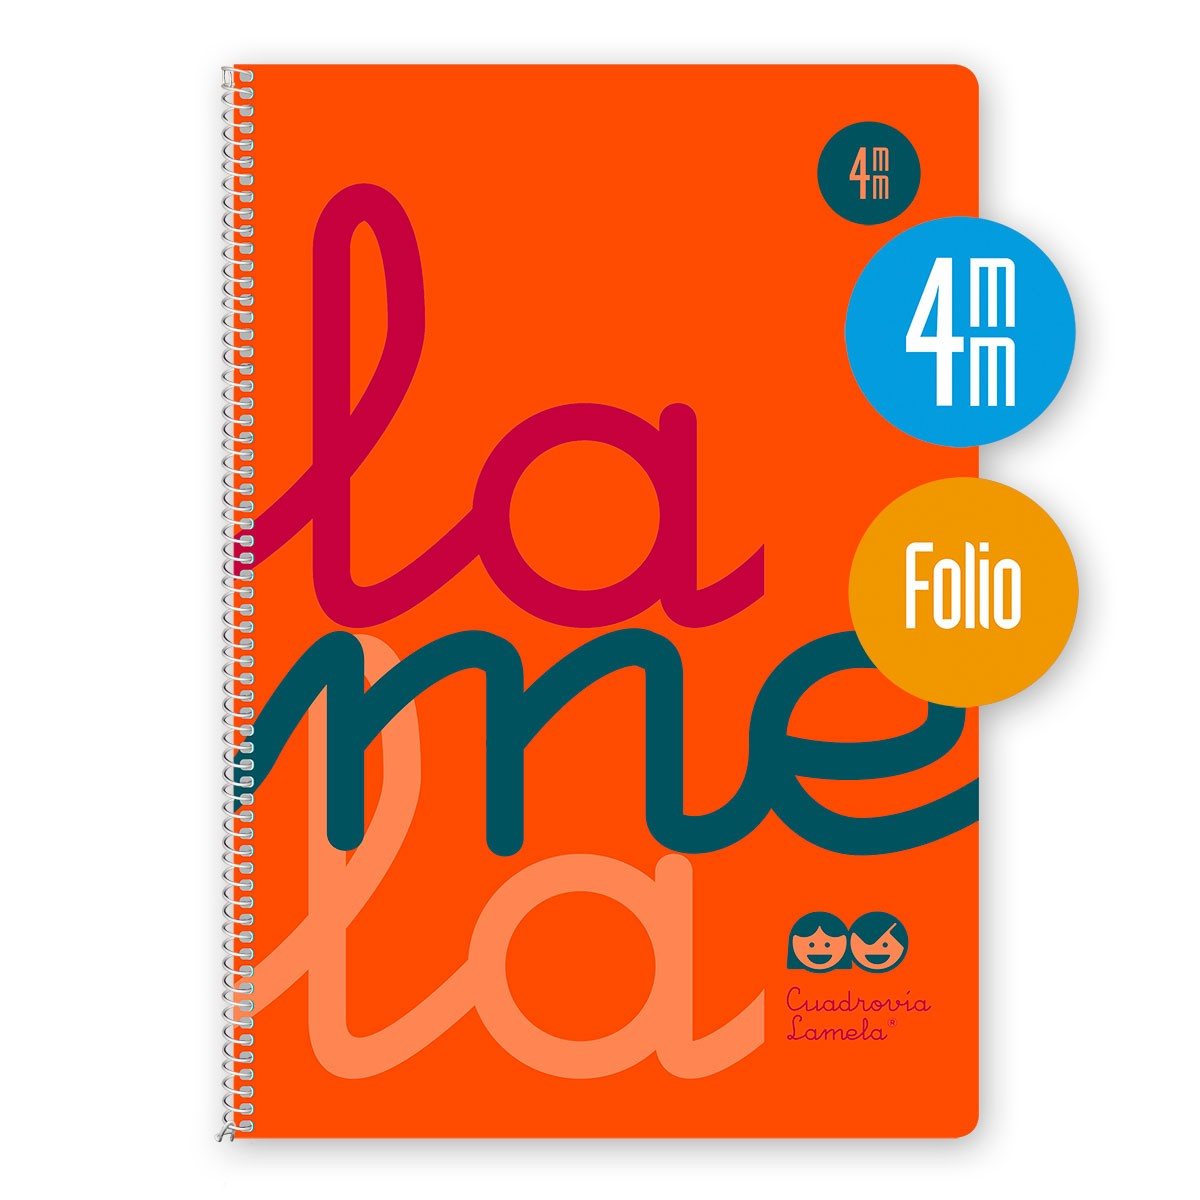 Cuaderno Espiral Folio 80 Hojas, 90 Grs. Cubierta Polipropileno Fluor. NARANJA. Cuadrovía 4mm.